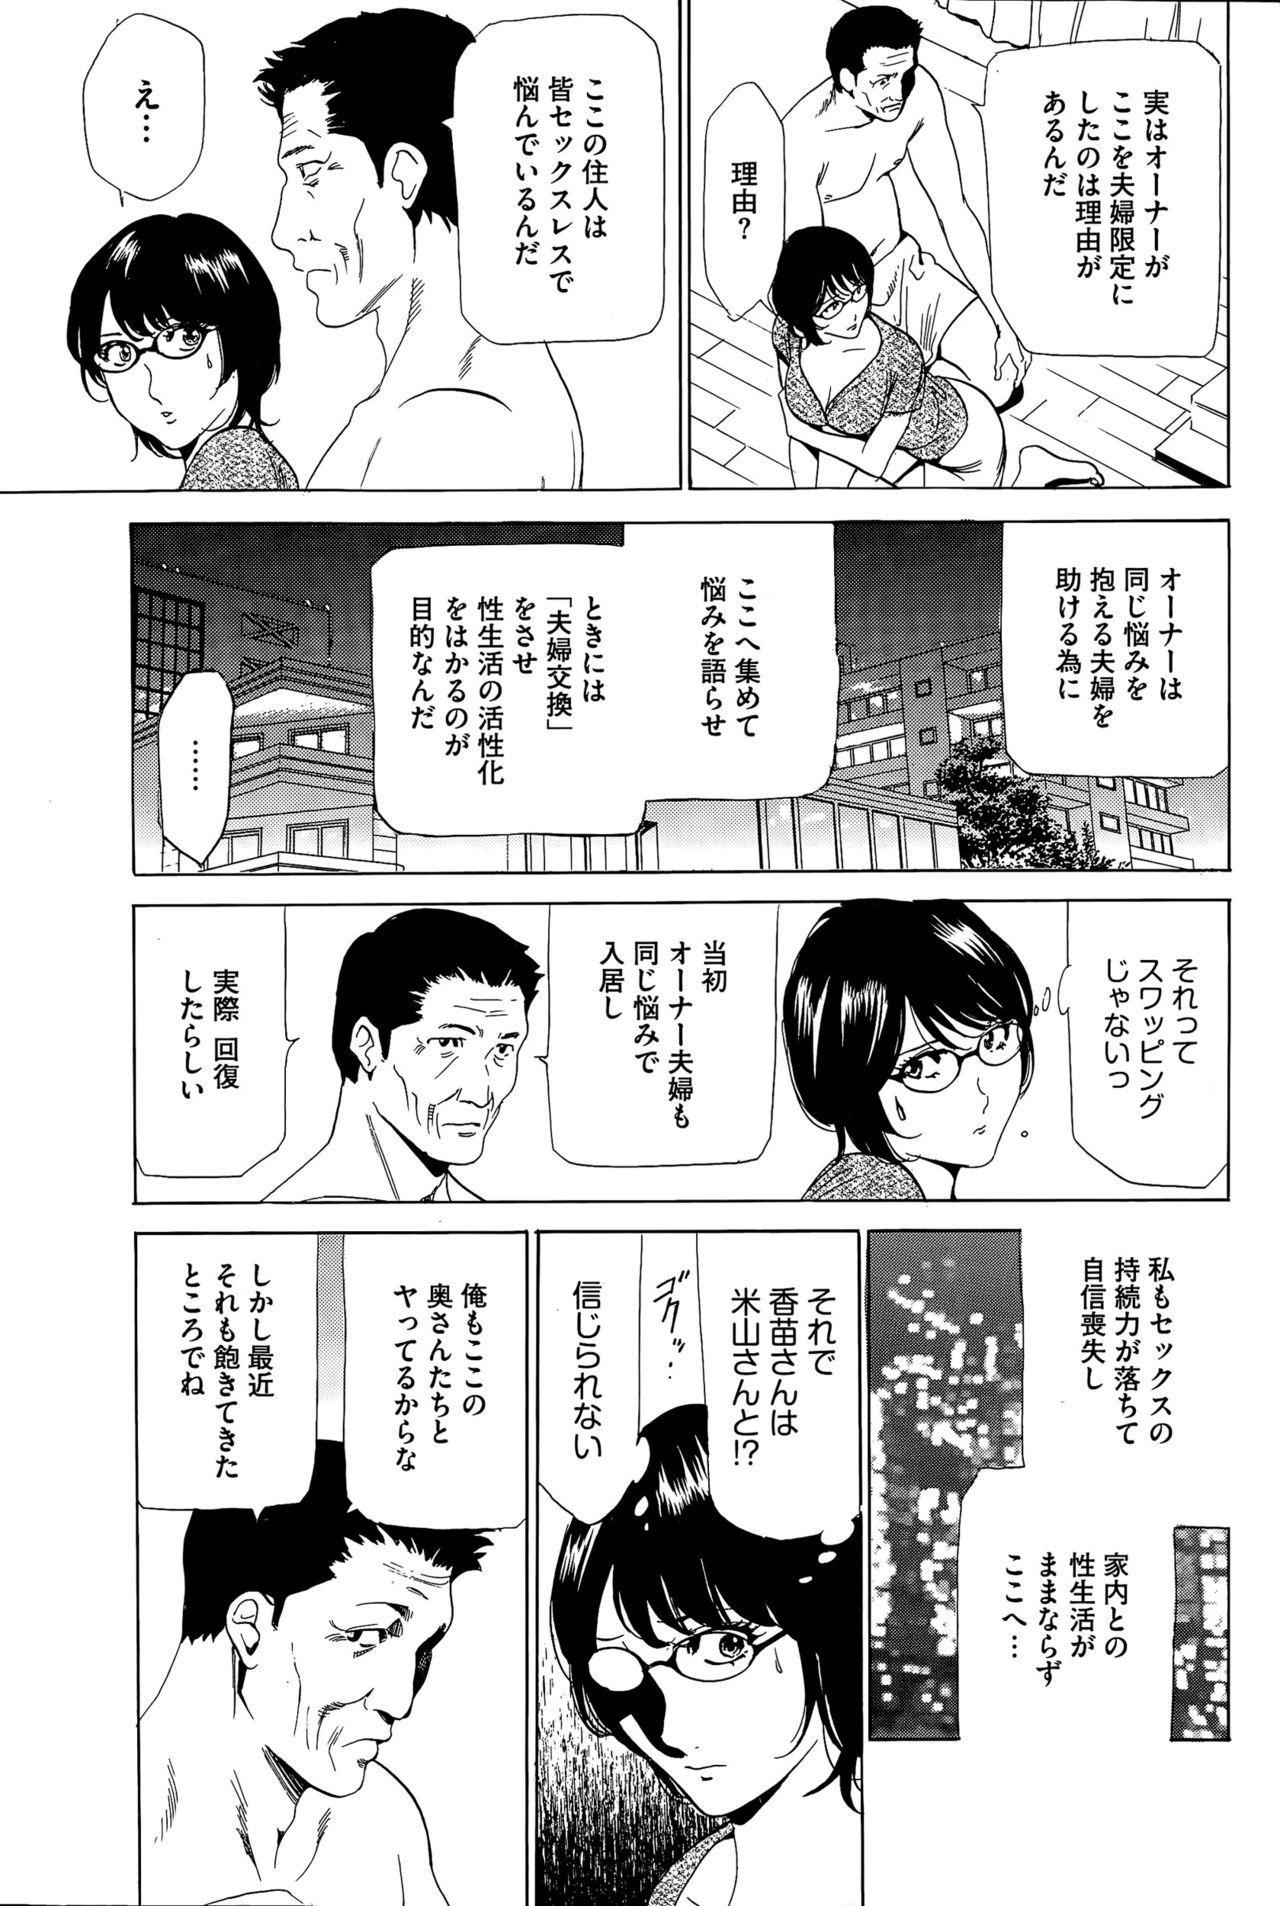 Wa Usuki Ipa a 1-10 13